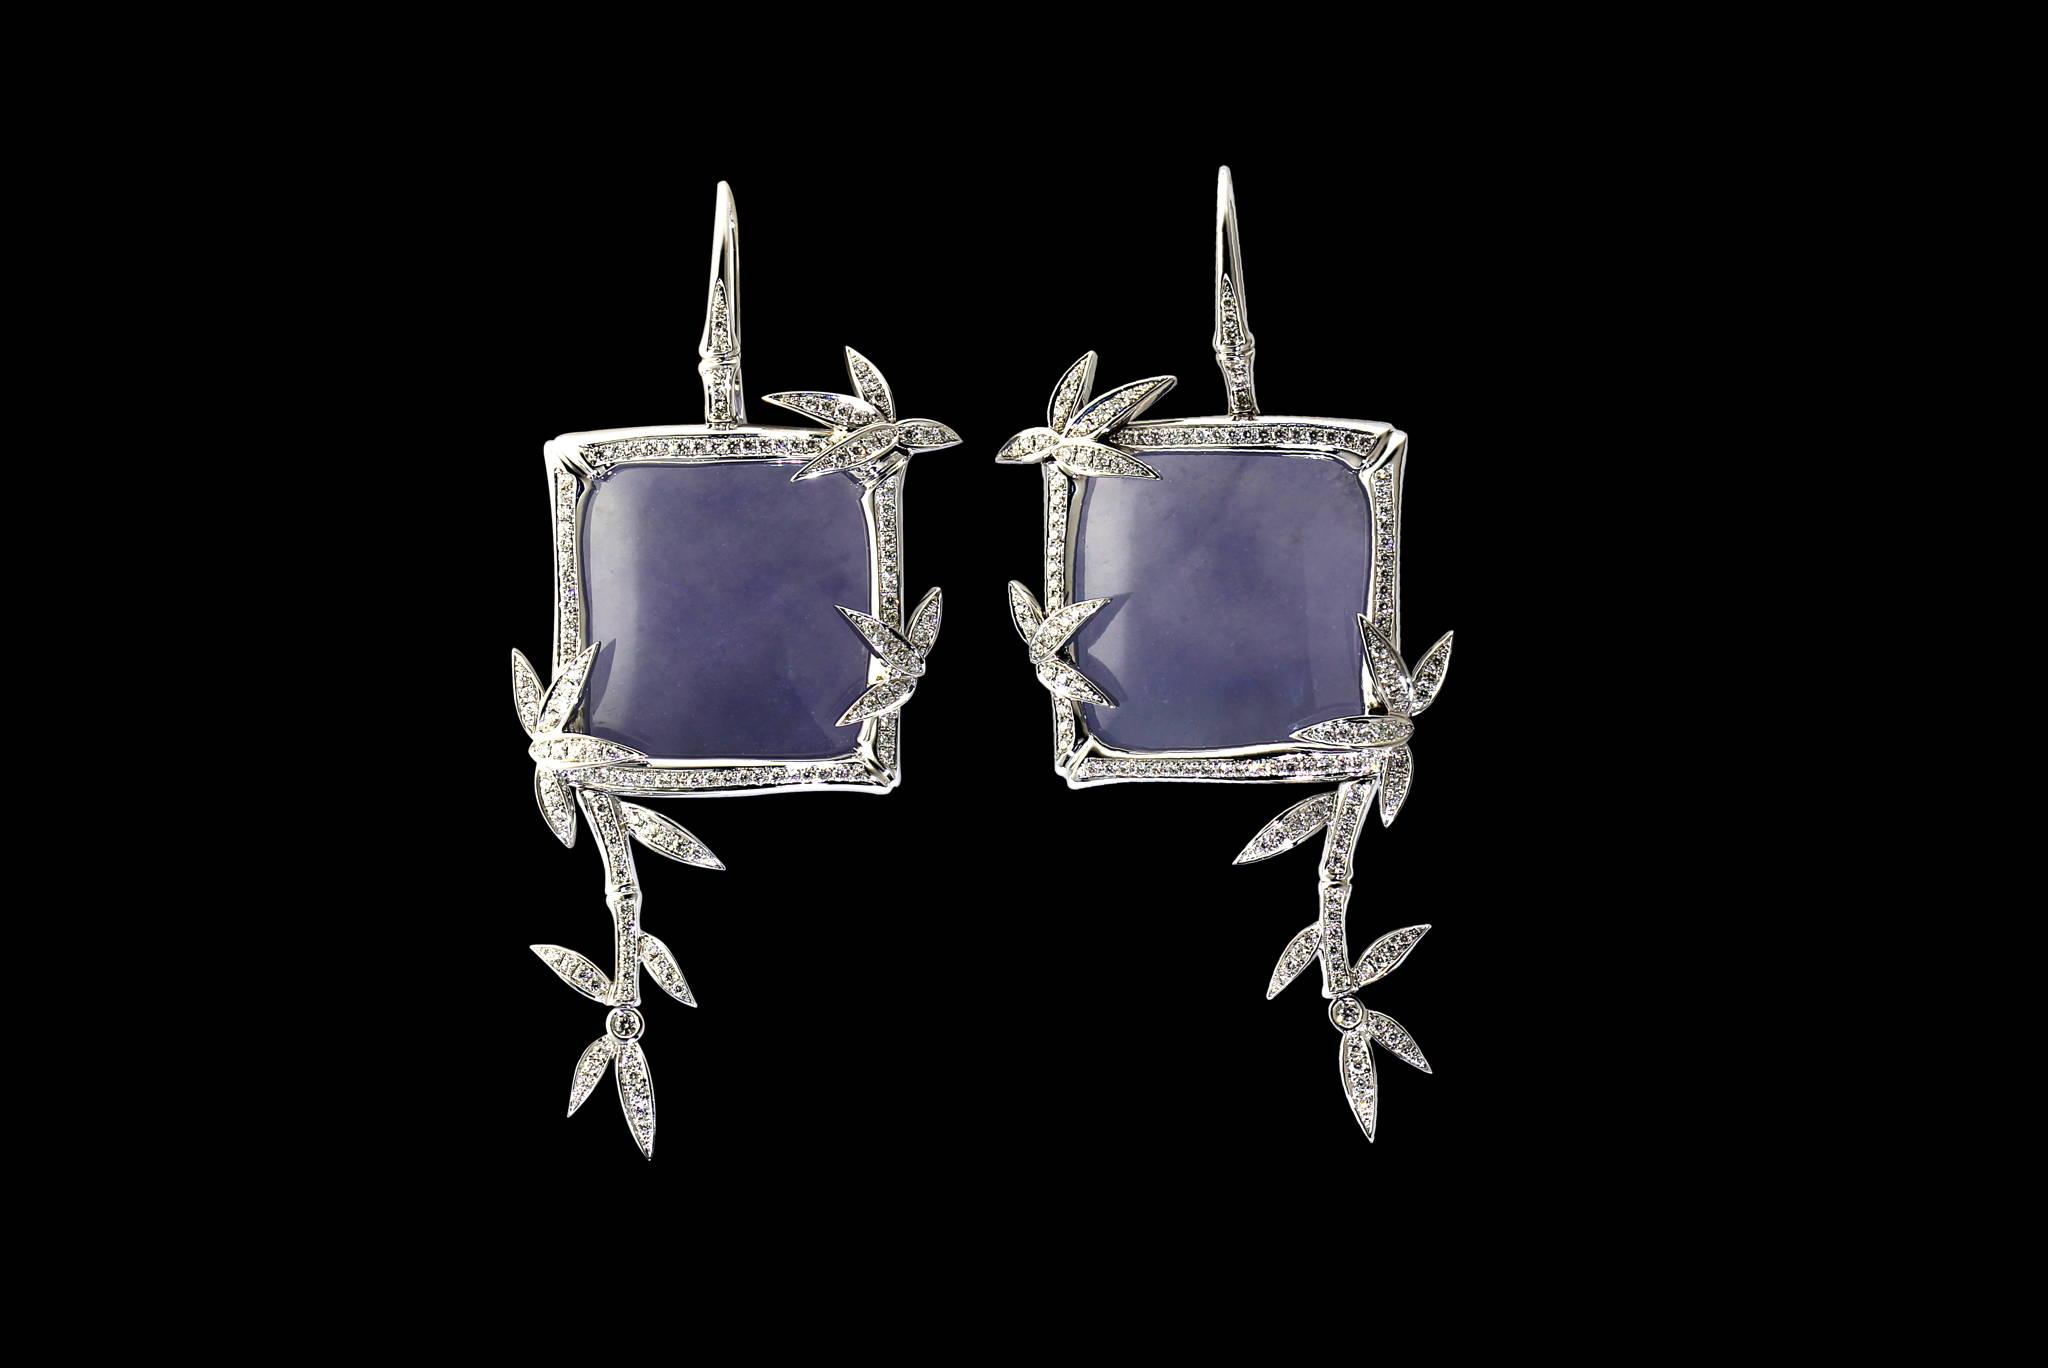 Lavender Jadeite bamboo earrings